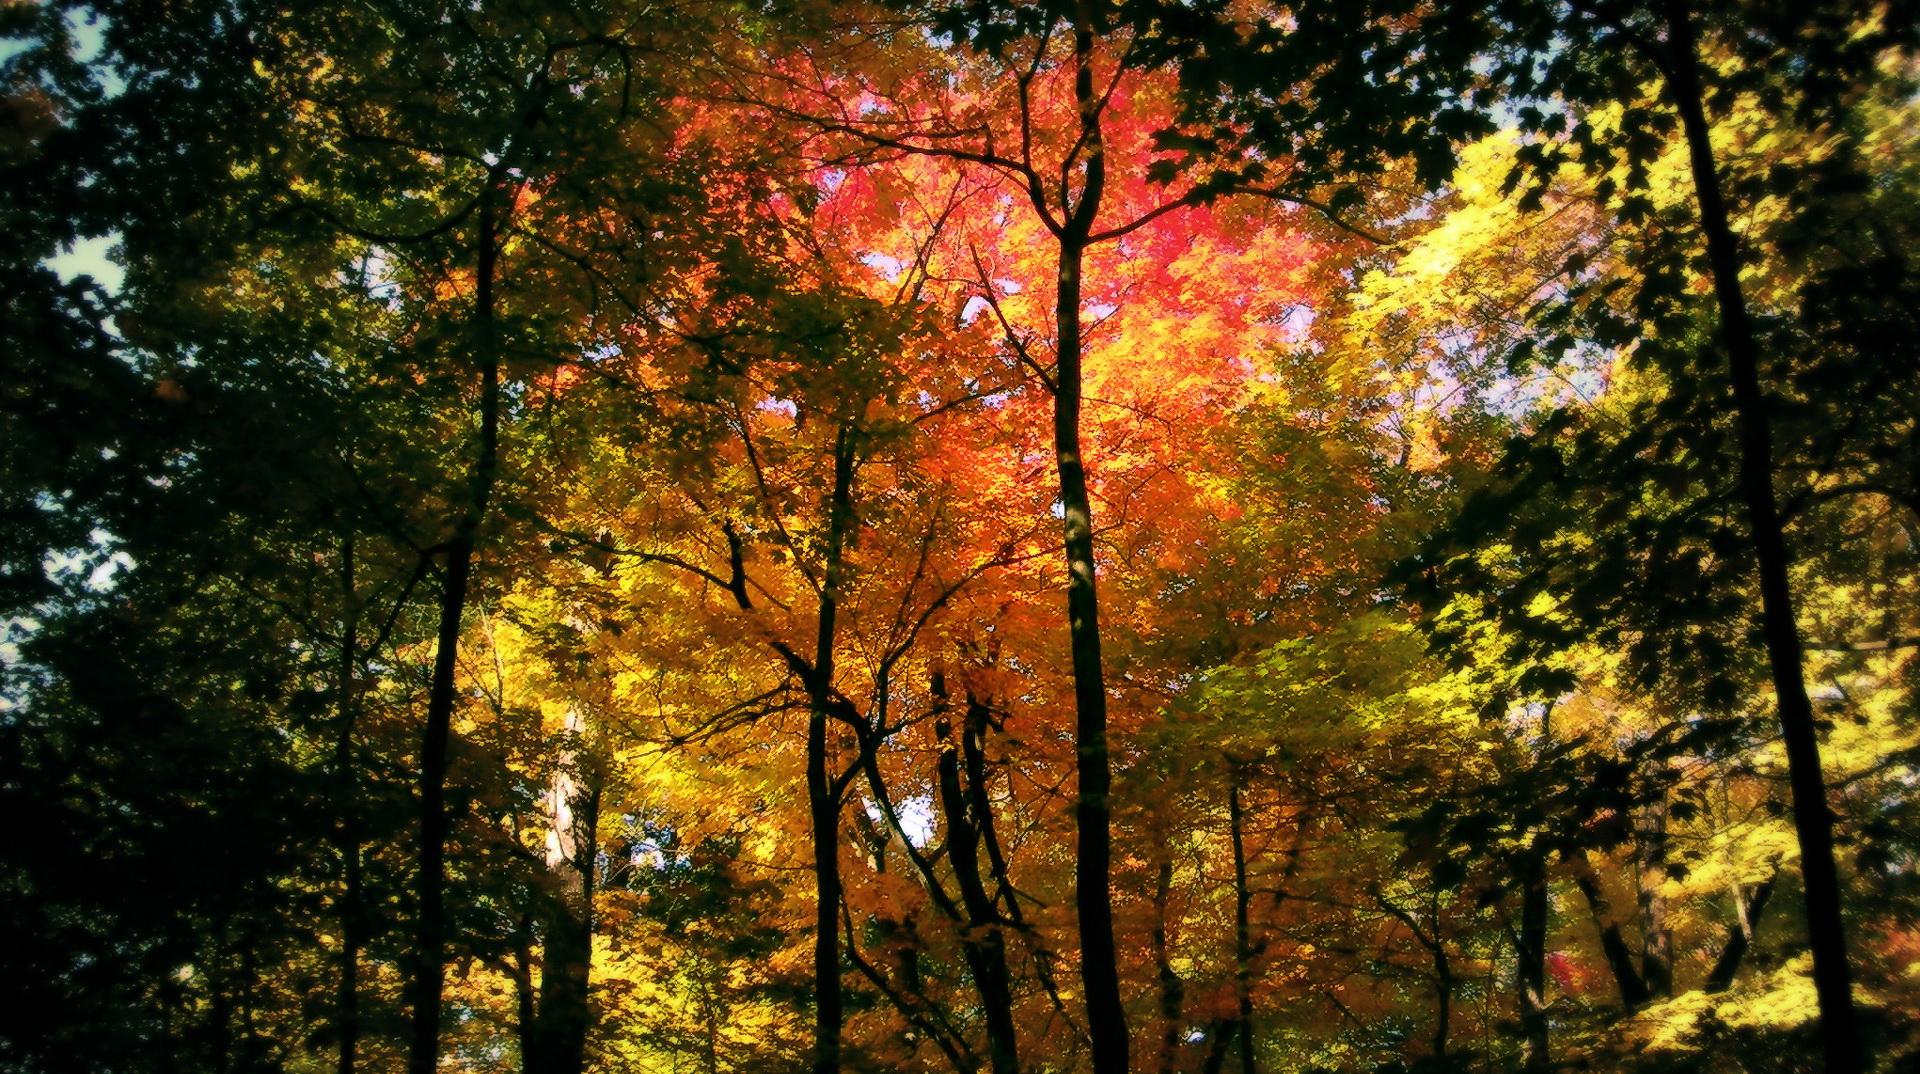 Natural Images Free Download